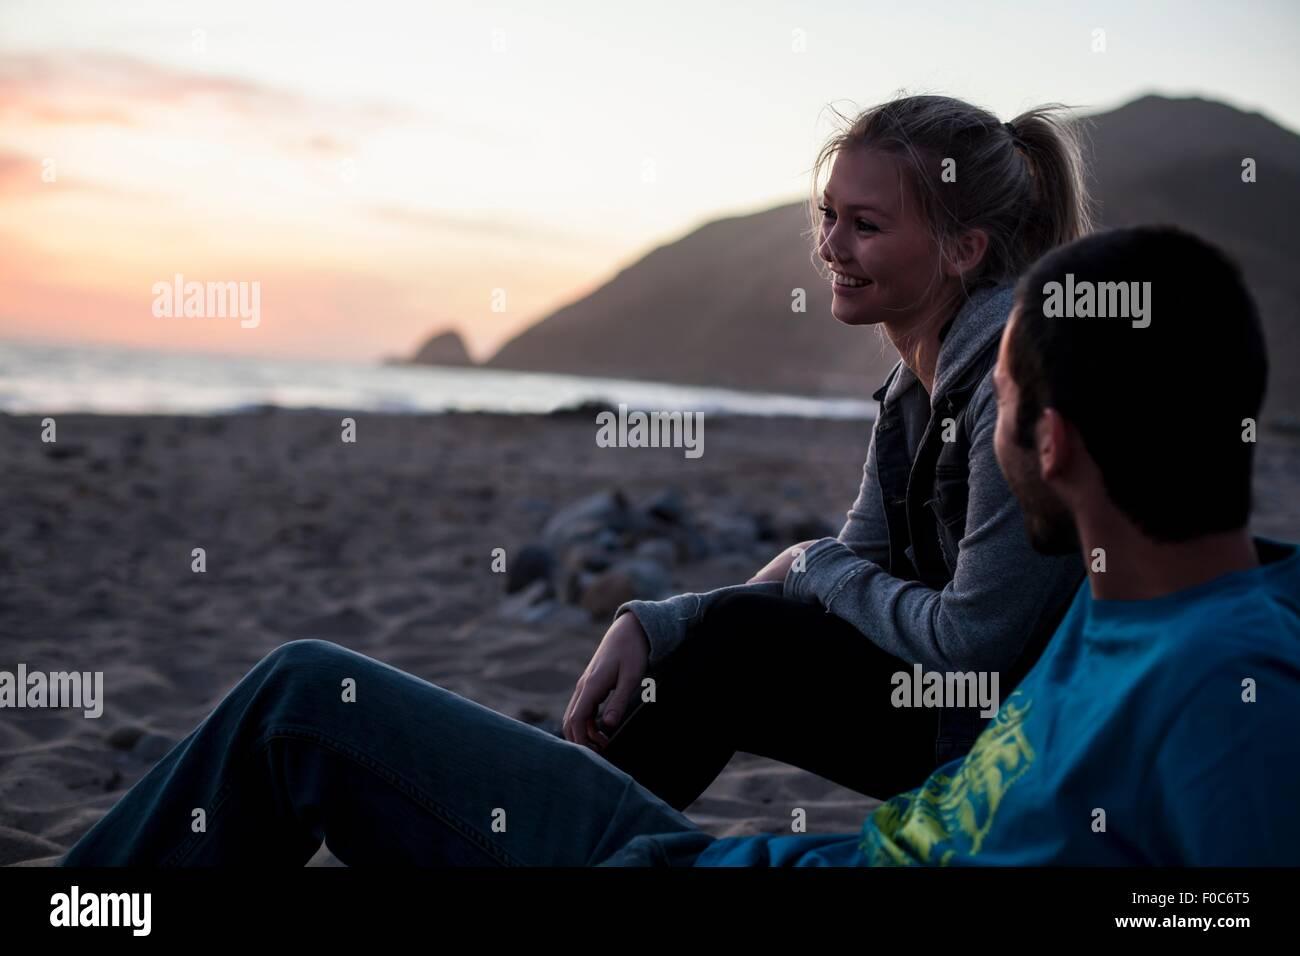 Couple on beach, Malibu, California, USA - Stock Image